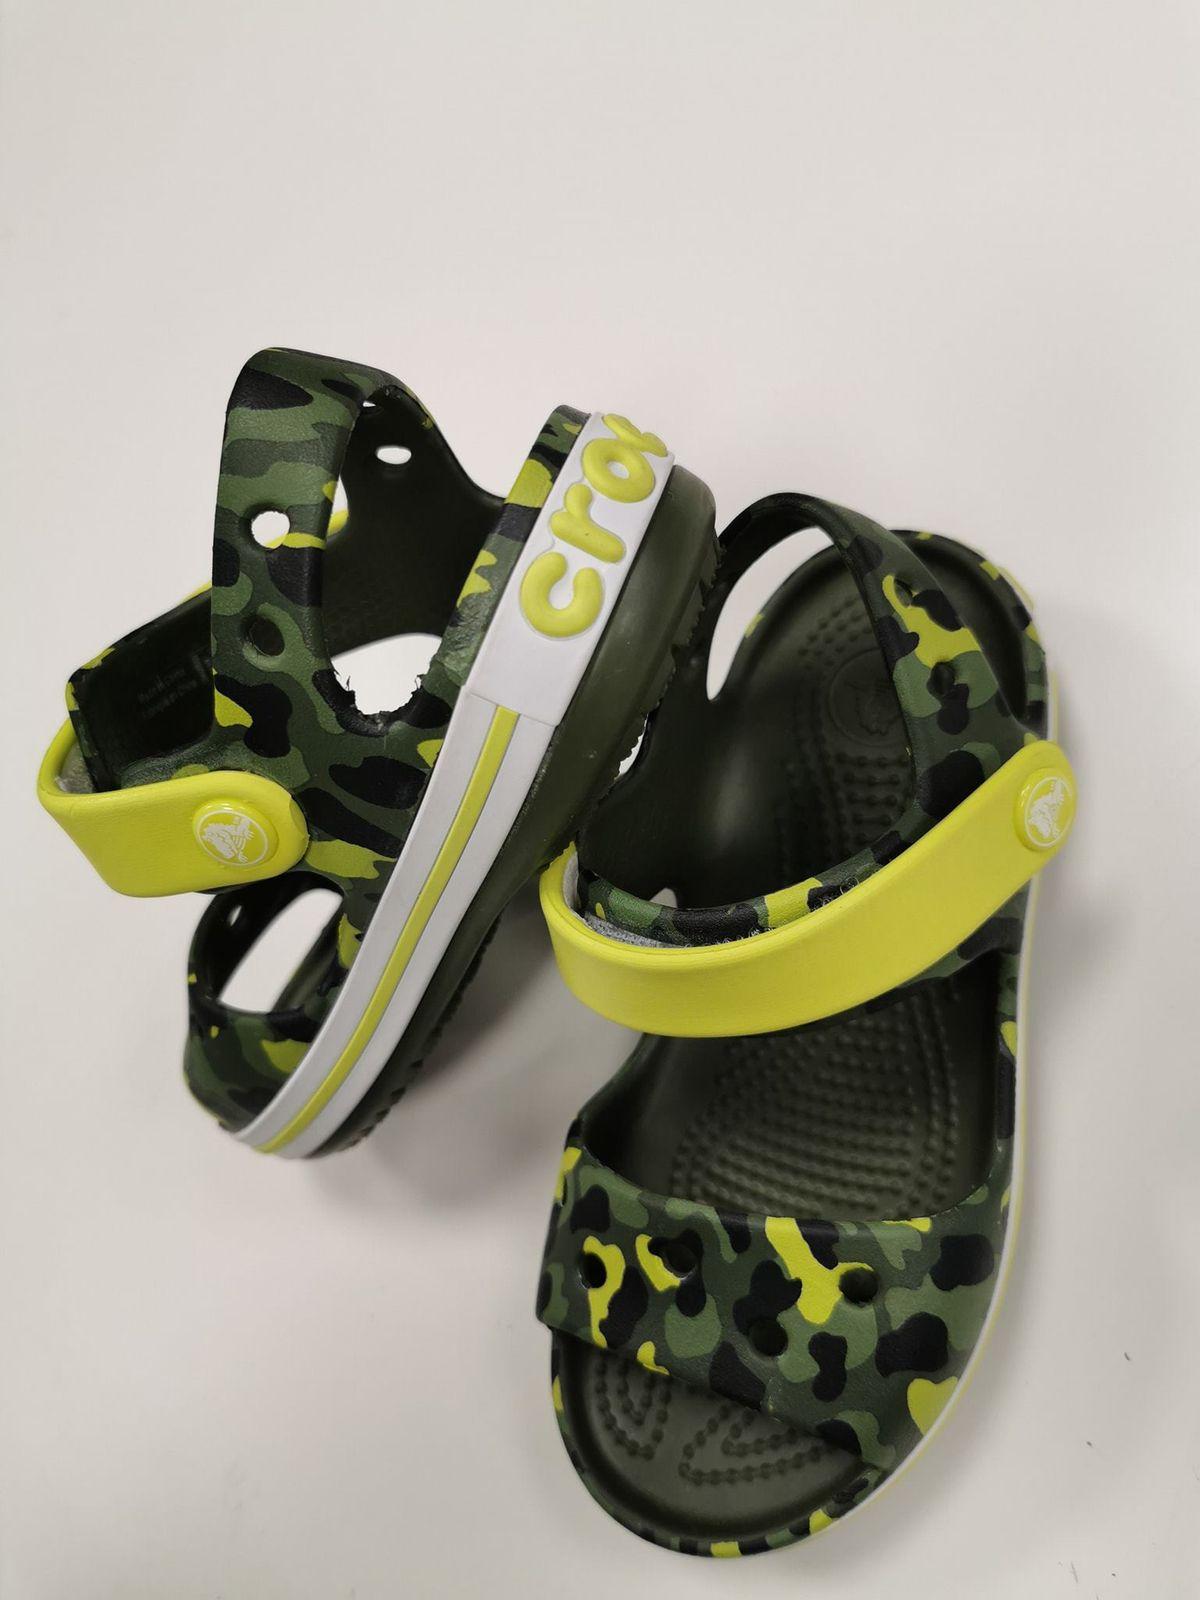 Crocs N 27 C 10 Nuove € 18,00. 11952